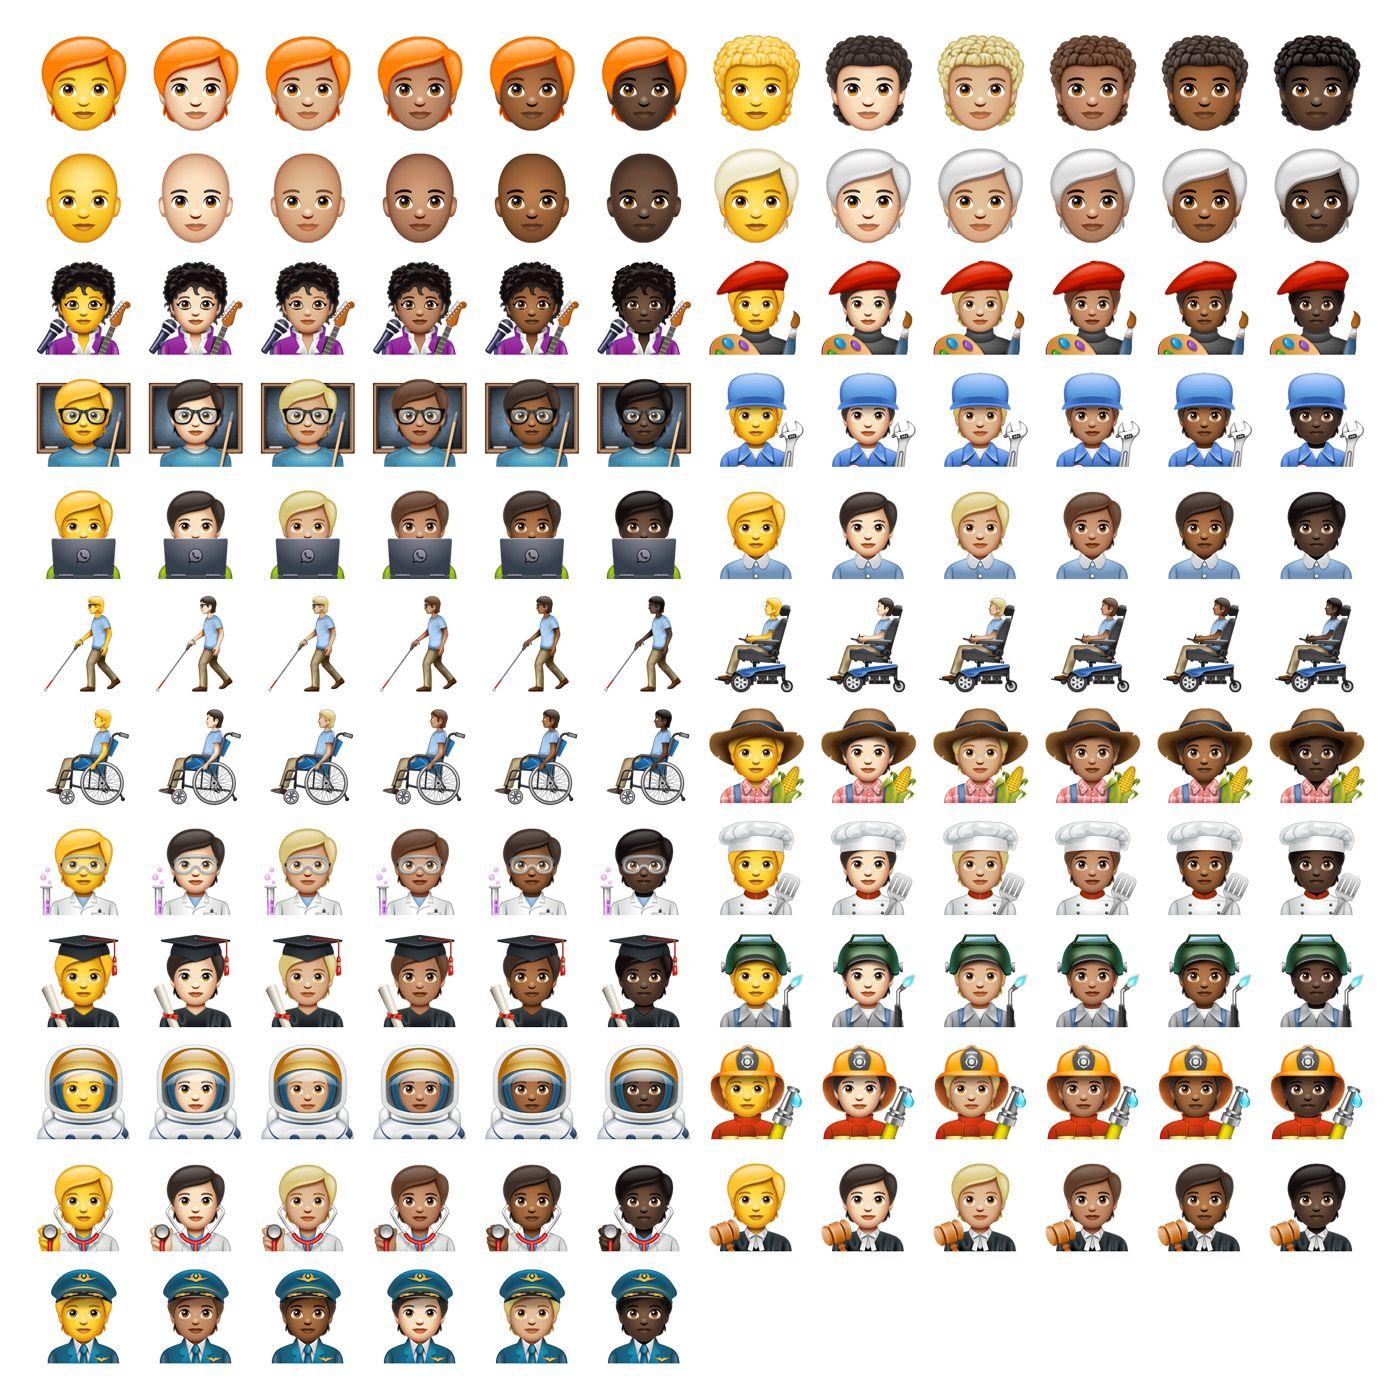 Emojipedia-WhatsApp-December-2020-Emoji-12_1-Setpemer-2020-All-New-Emojis